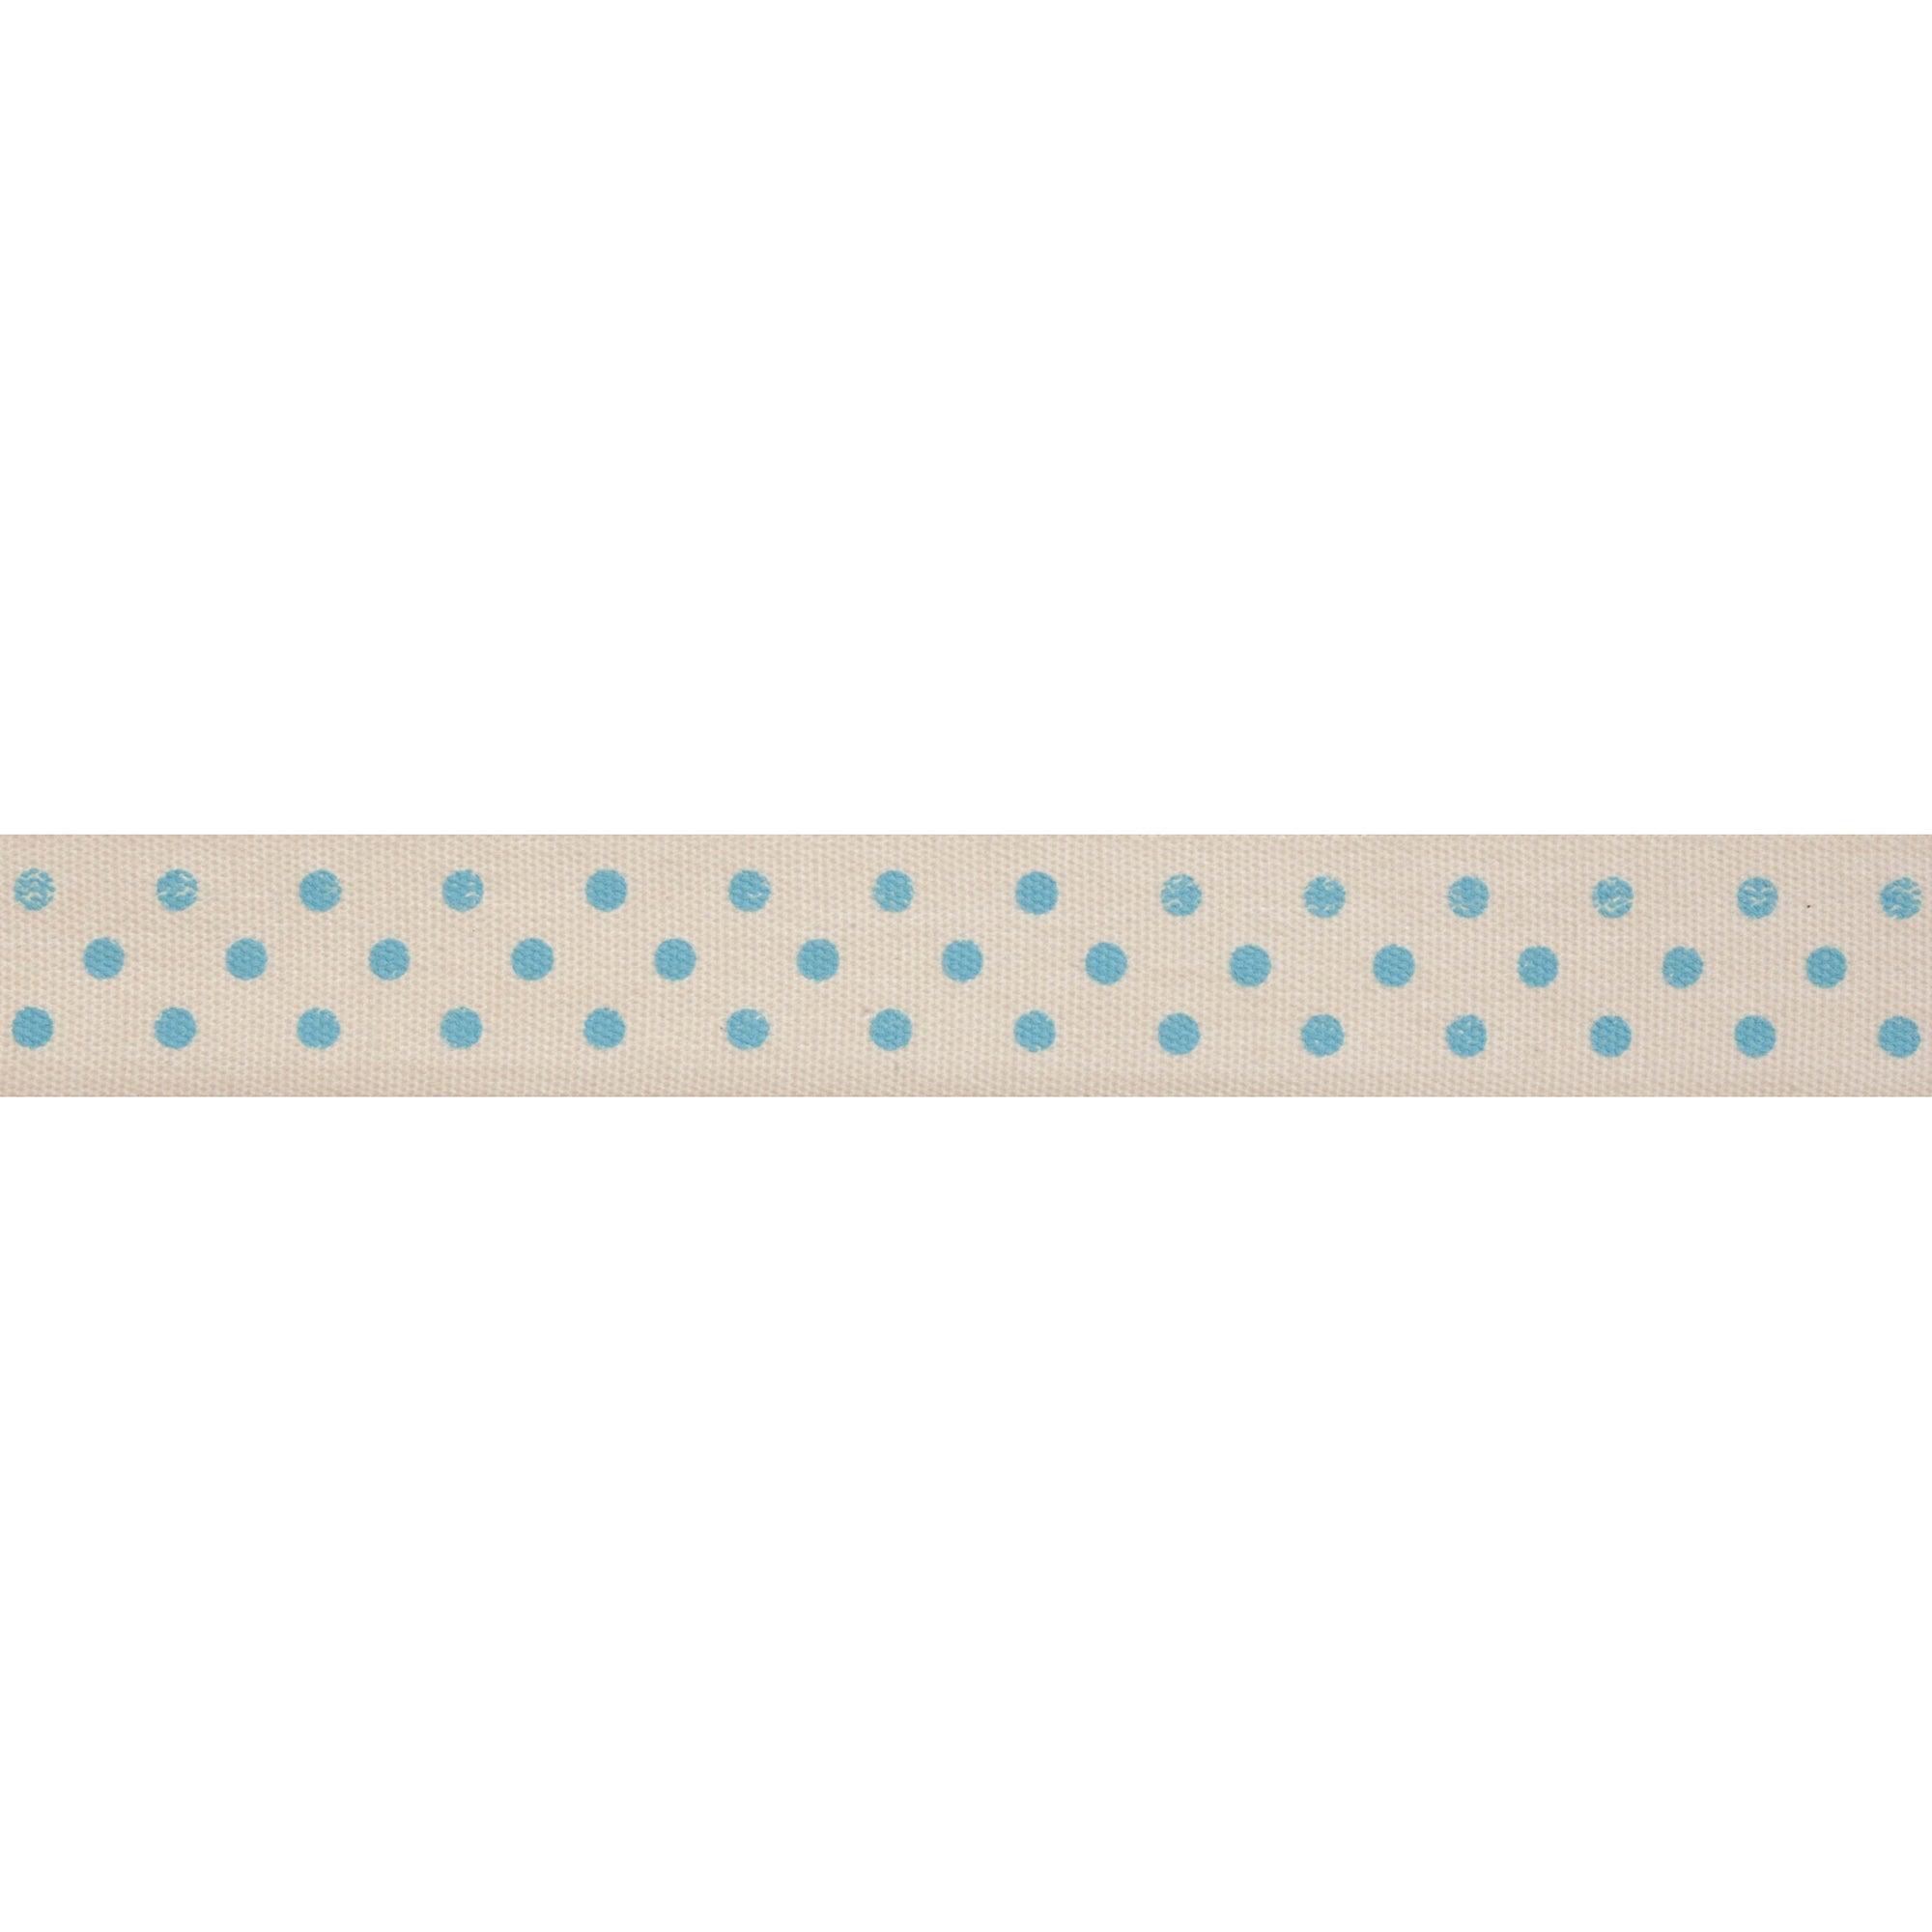 Bowtique Blue Dot Ribbon